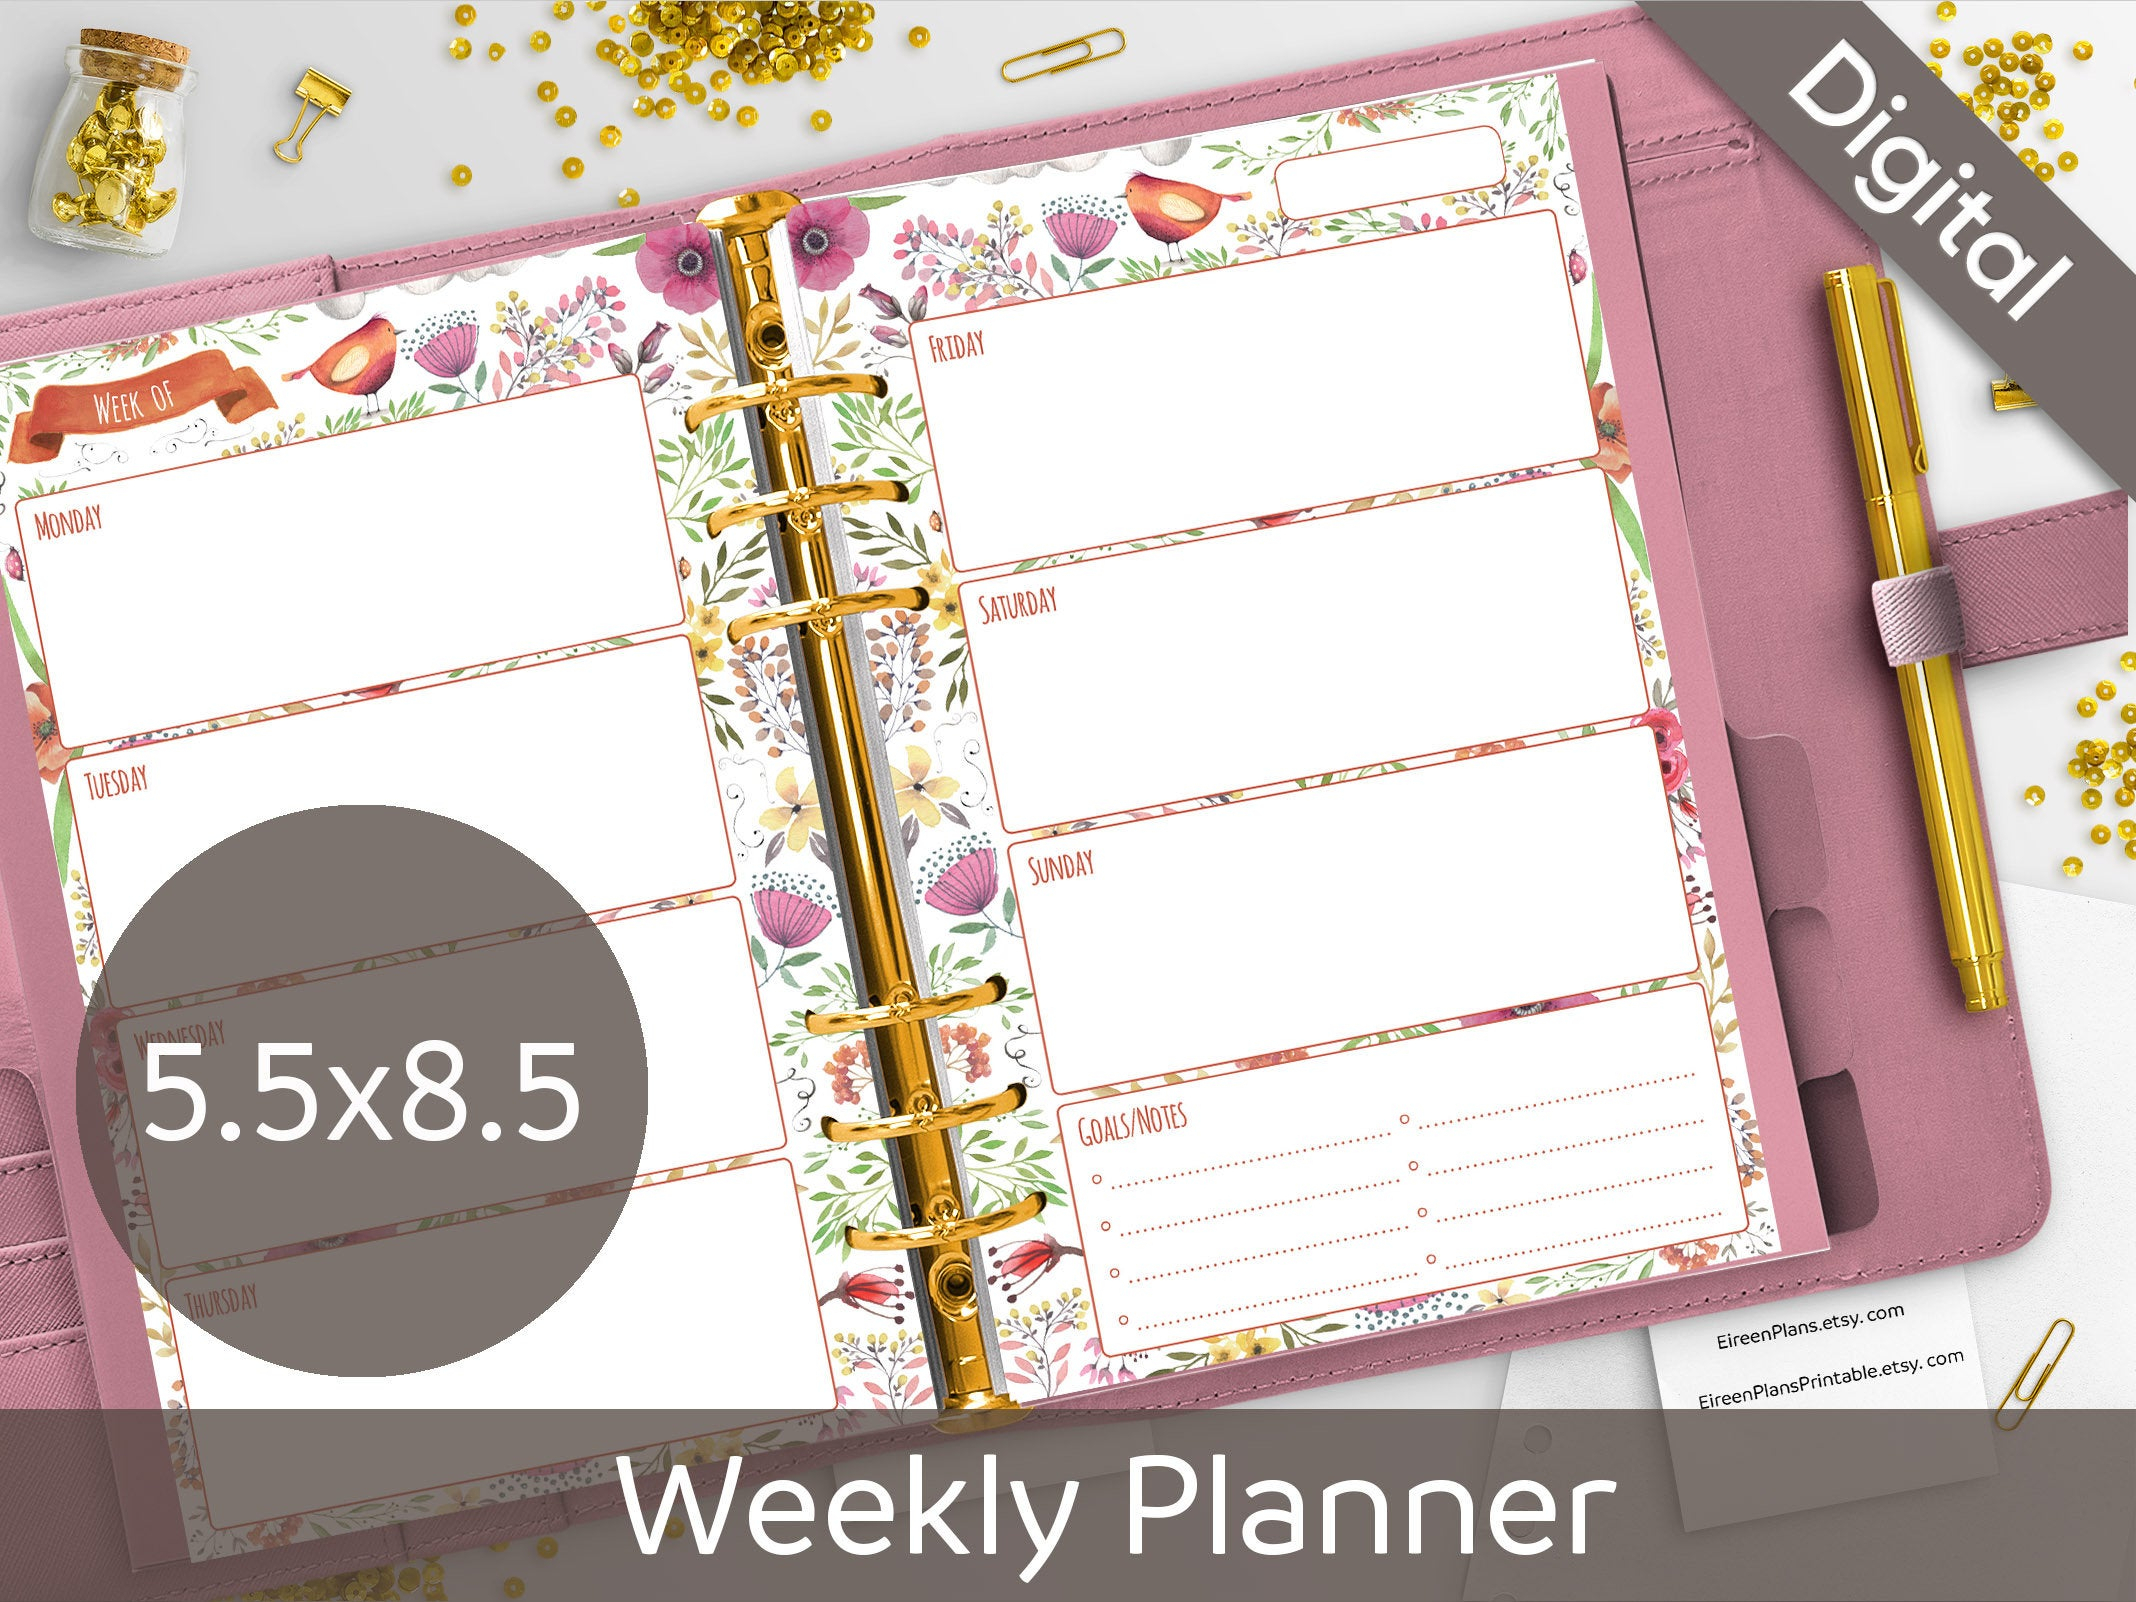 5.5X8.5 Weekly Planner Printable Undated Weekly Half Size | Etsy